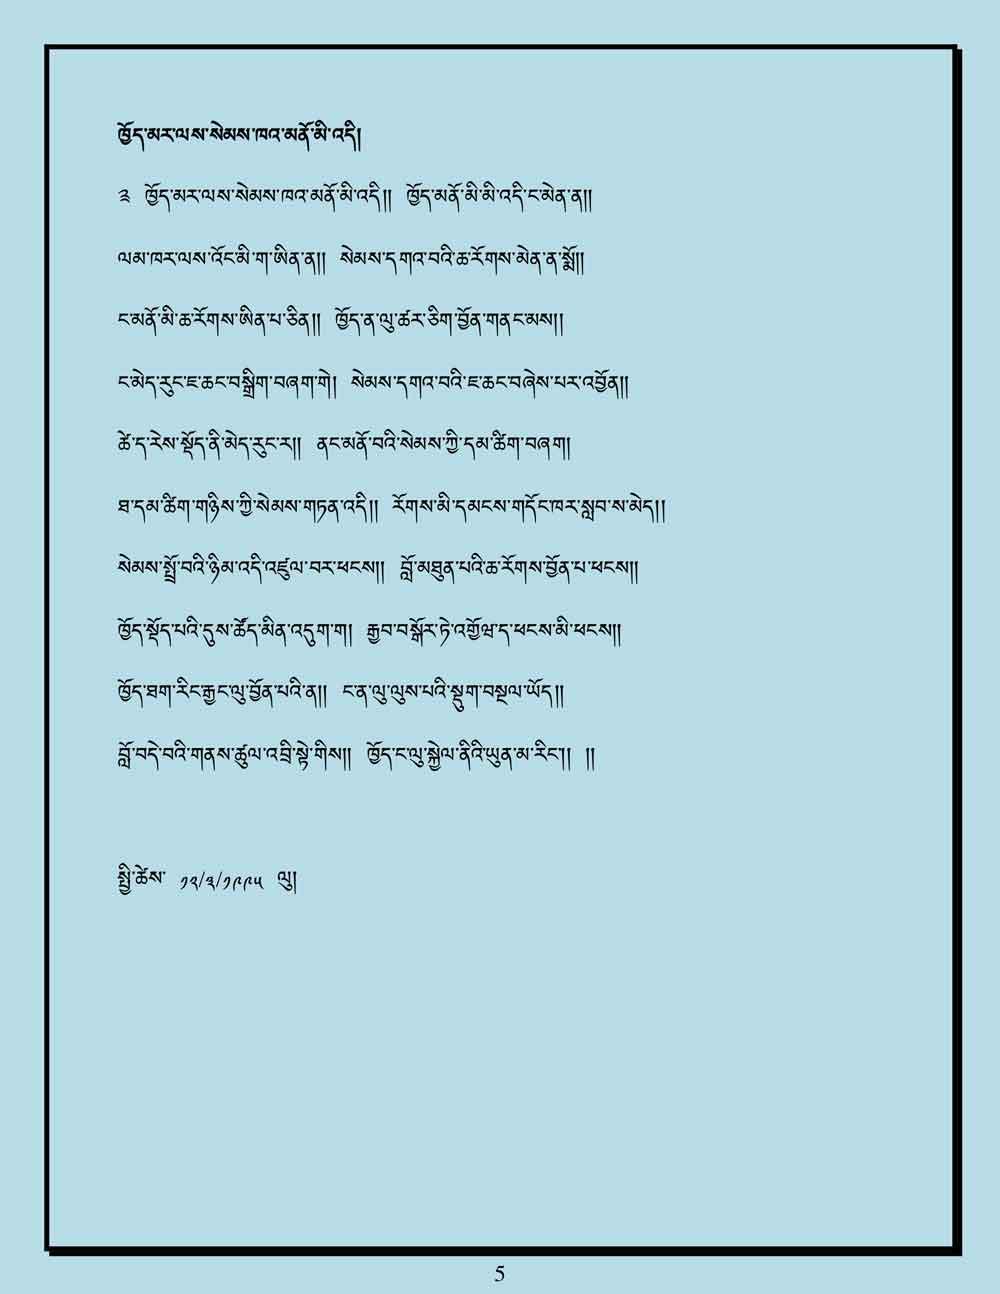 Ap-Gangkar-Lyrics-5.jpg